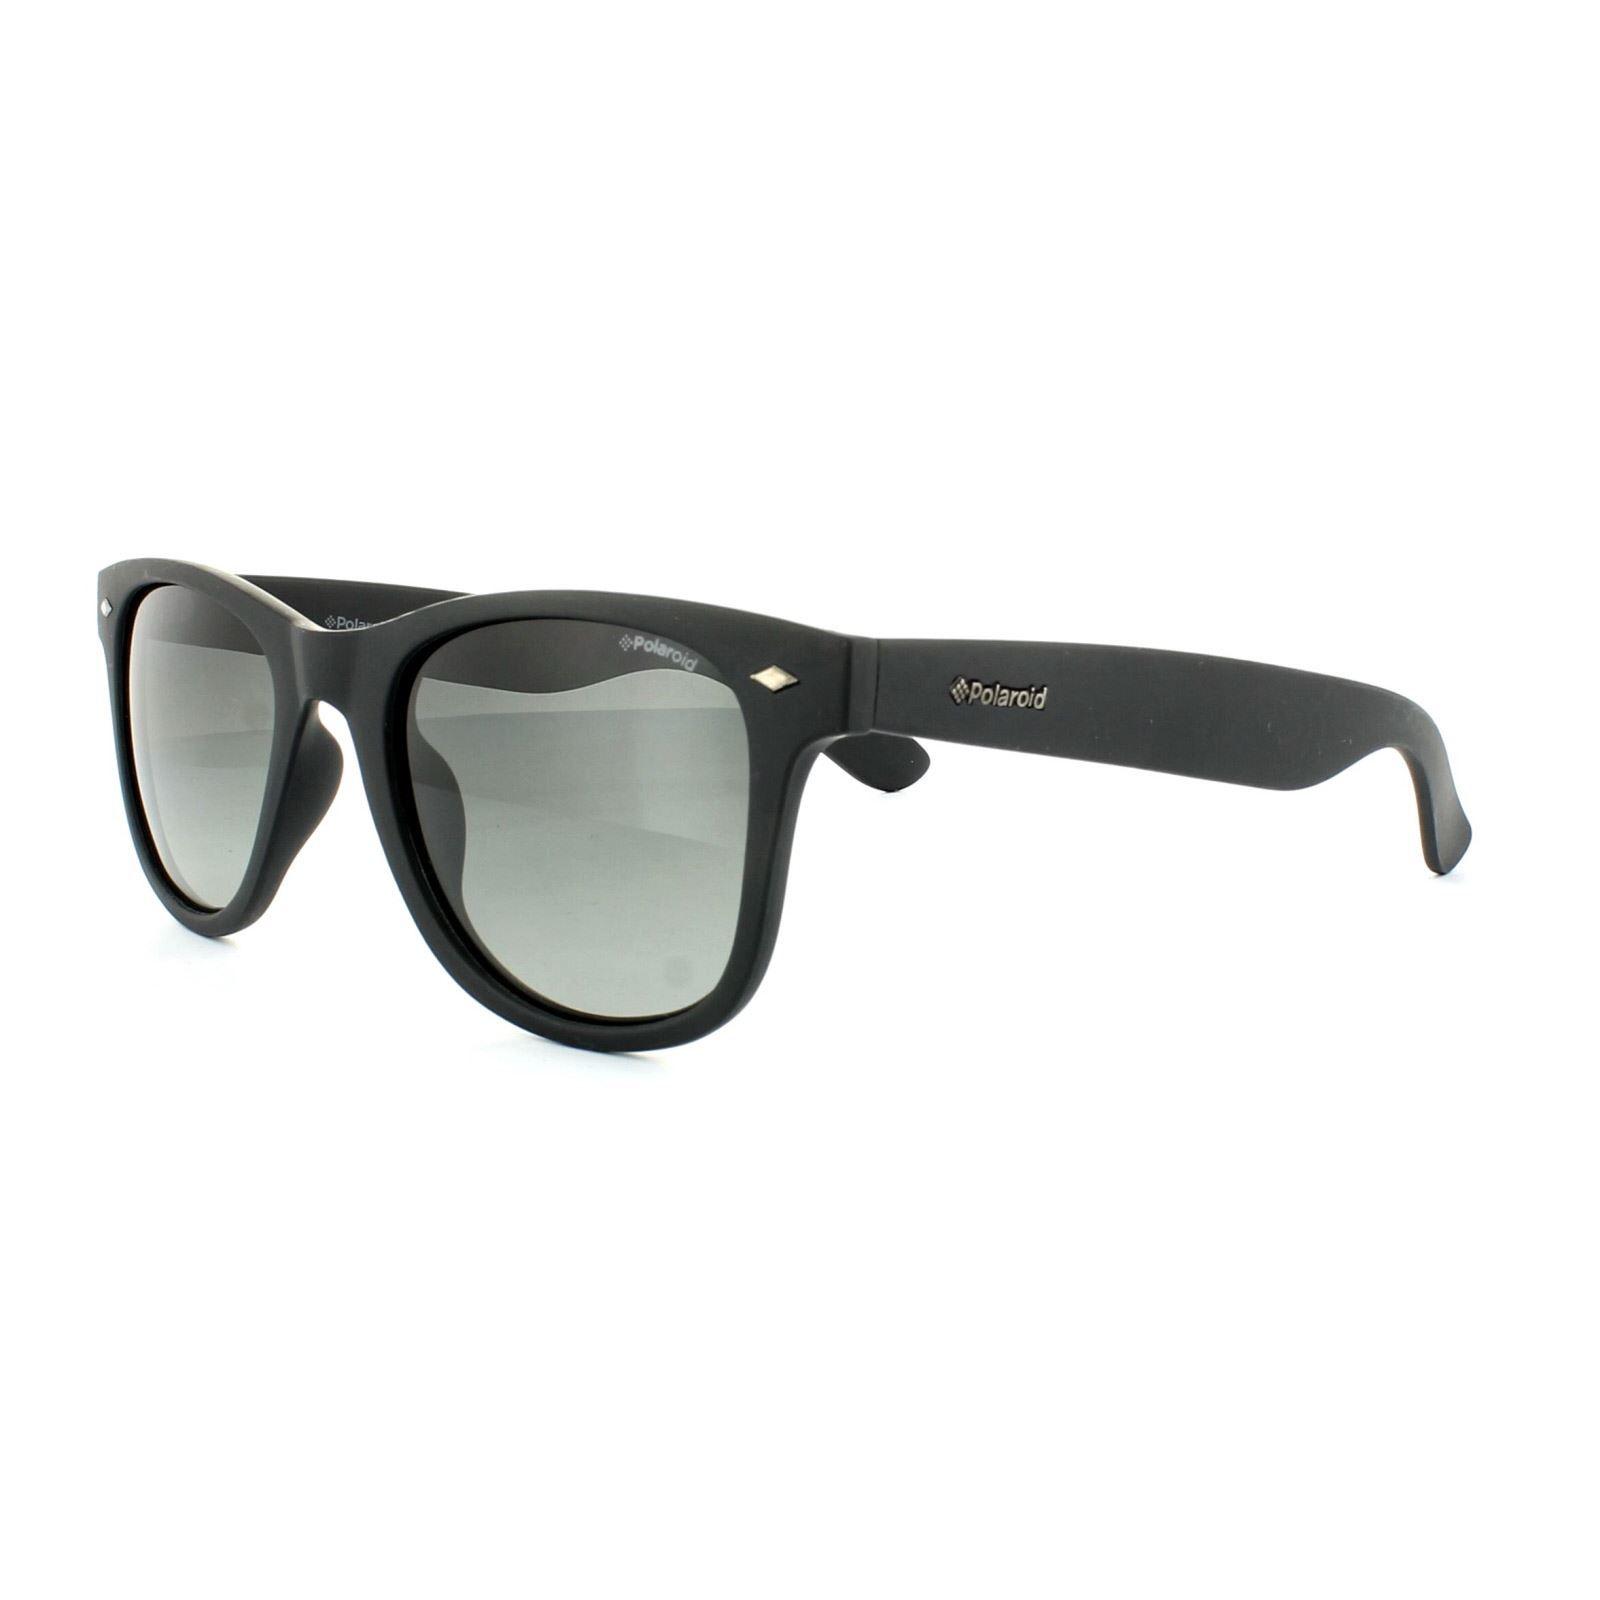 Polaroid Sunglasses PLD 1016/S DL5 LB Matt Black Green Gradient Polarized